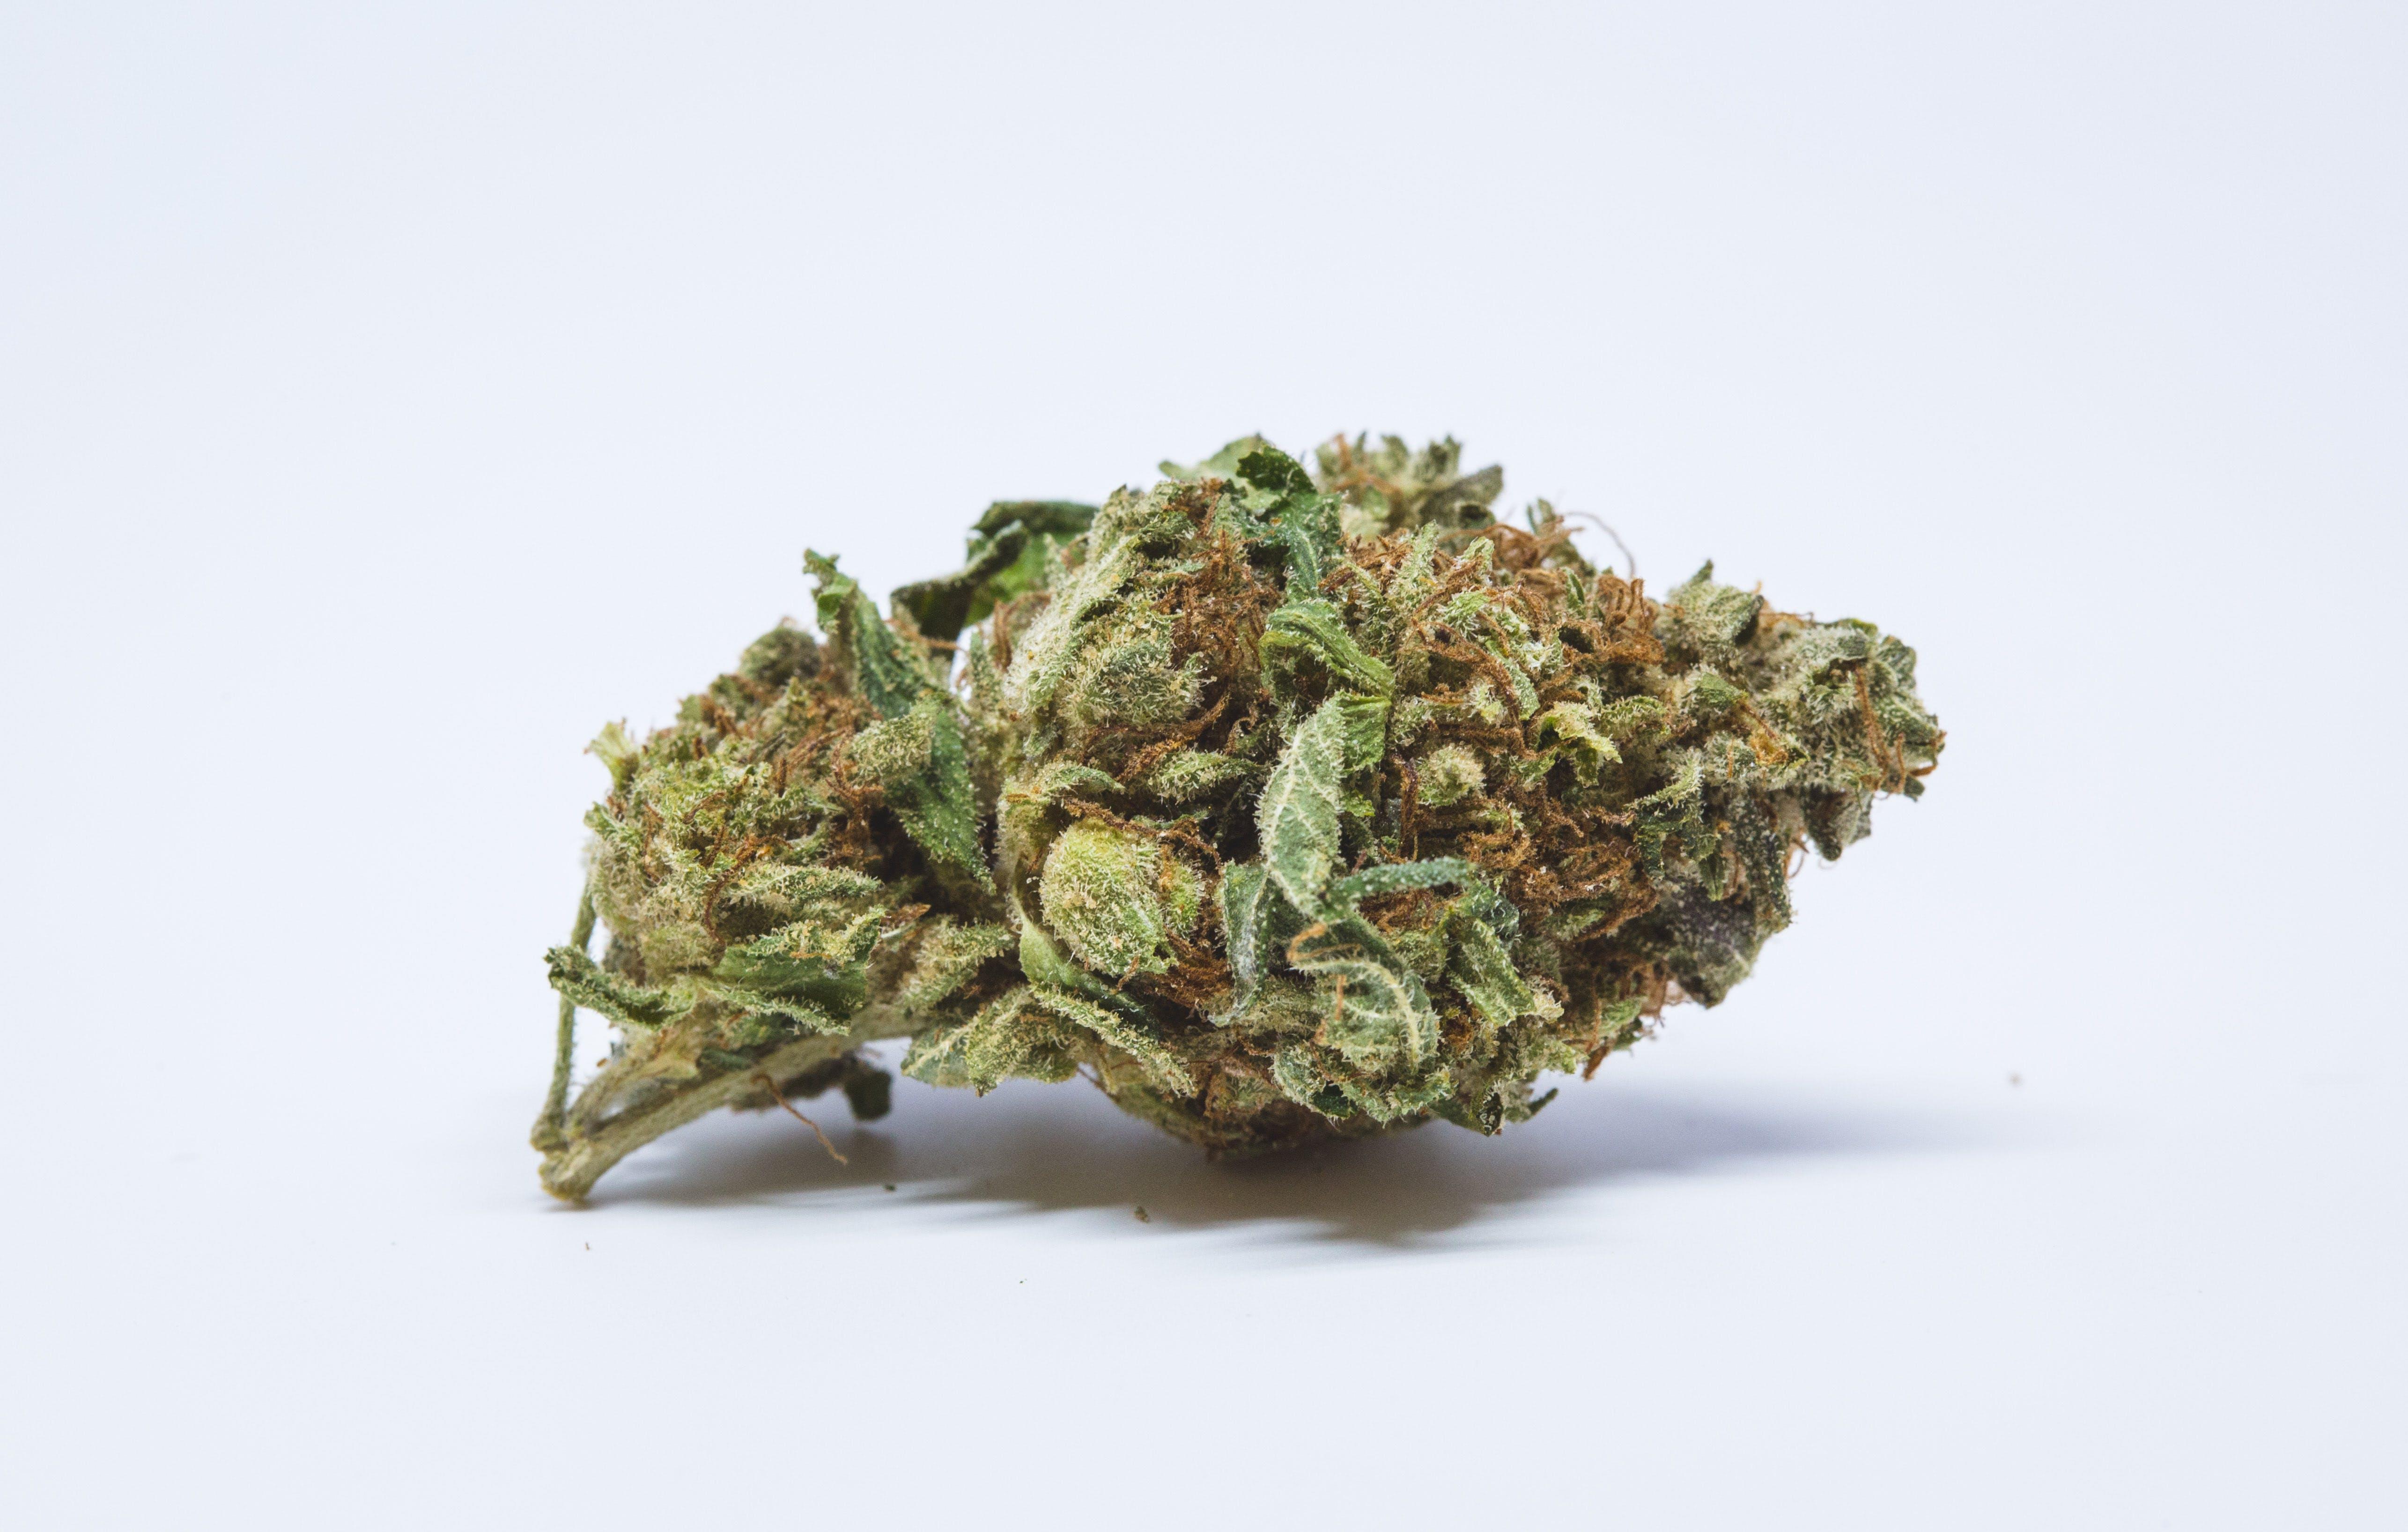 Apollo 13 Weed; Apollo 13 Cannabis Strain; Apollo 13 Hybrid Marijuana Strain